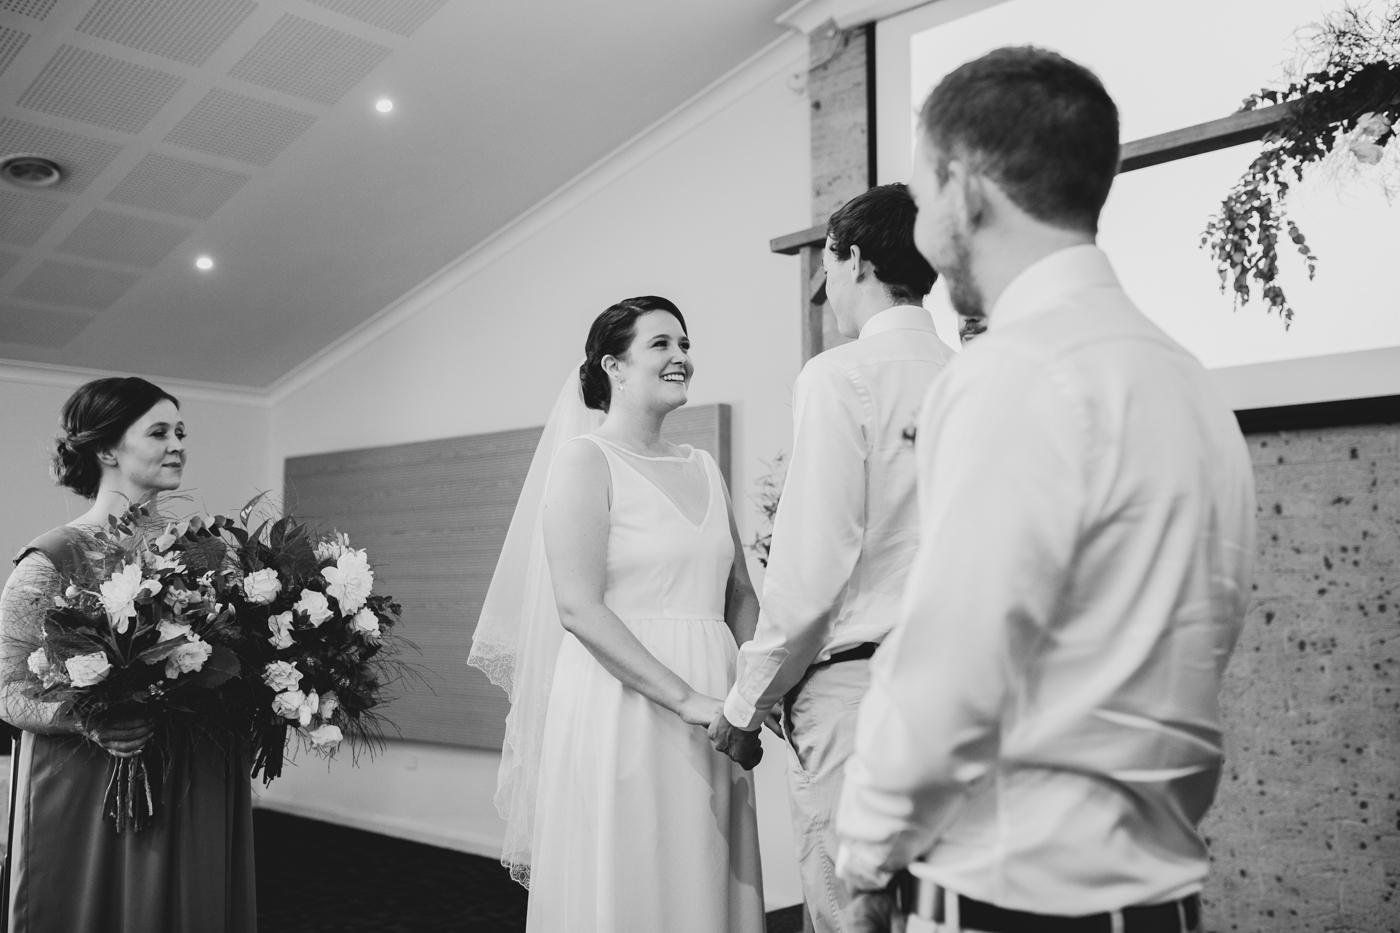 Nicolle & Jacob - Dubbo Wedding - Country Australia - Samantha Heather Photography-103.jpg